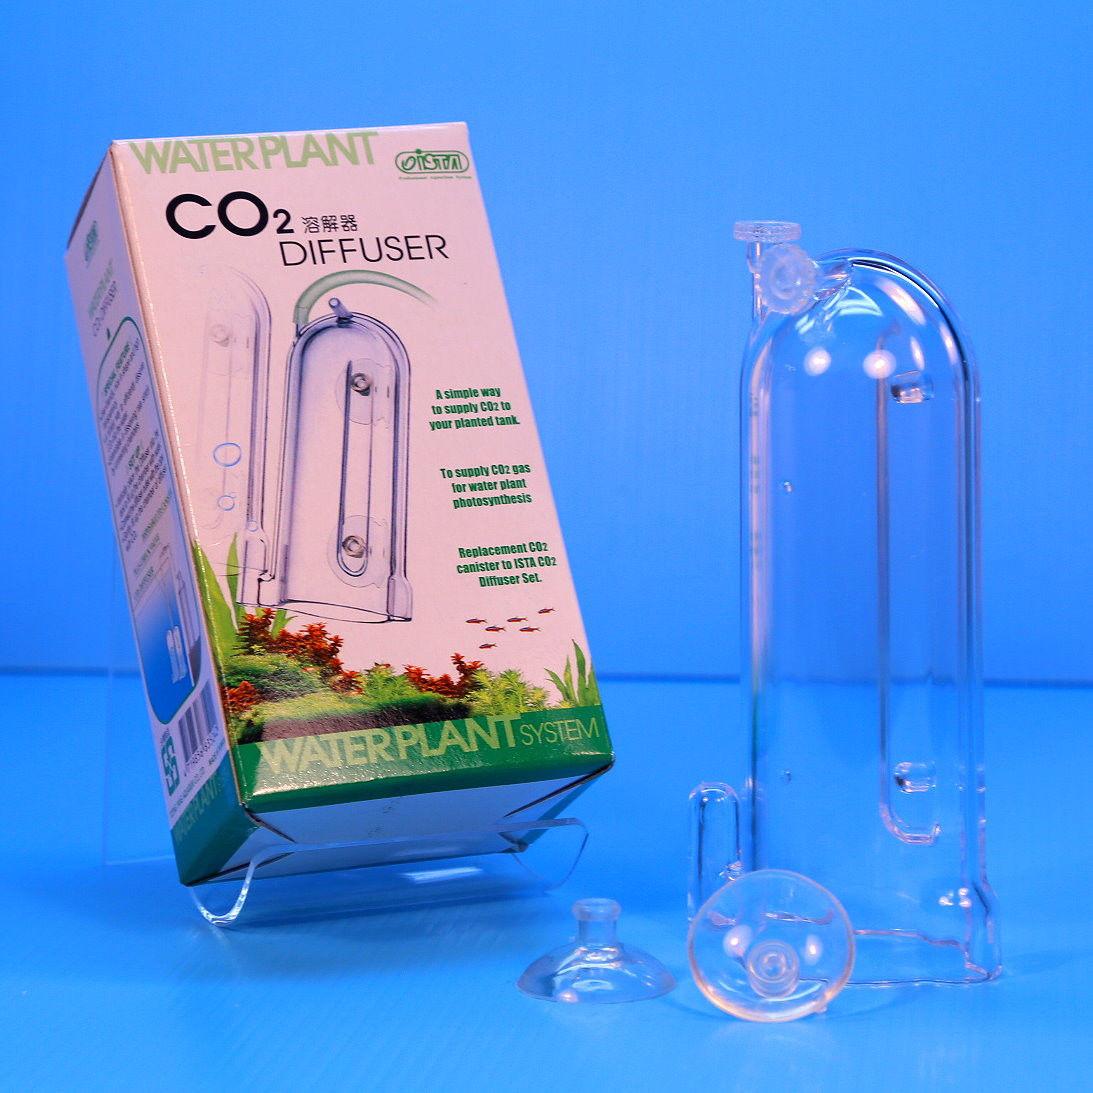 ISTA Aquarium CO2 diffuser for DIY yeast bottles disposable co2 cartridge plant tank